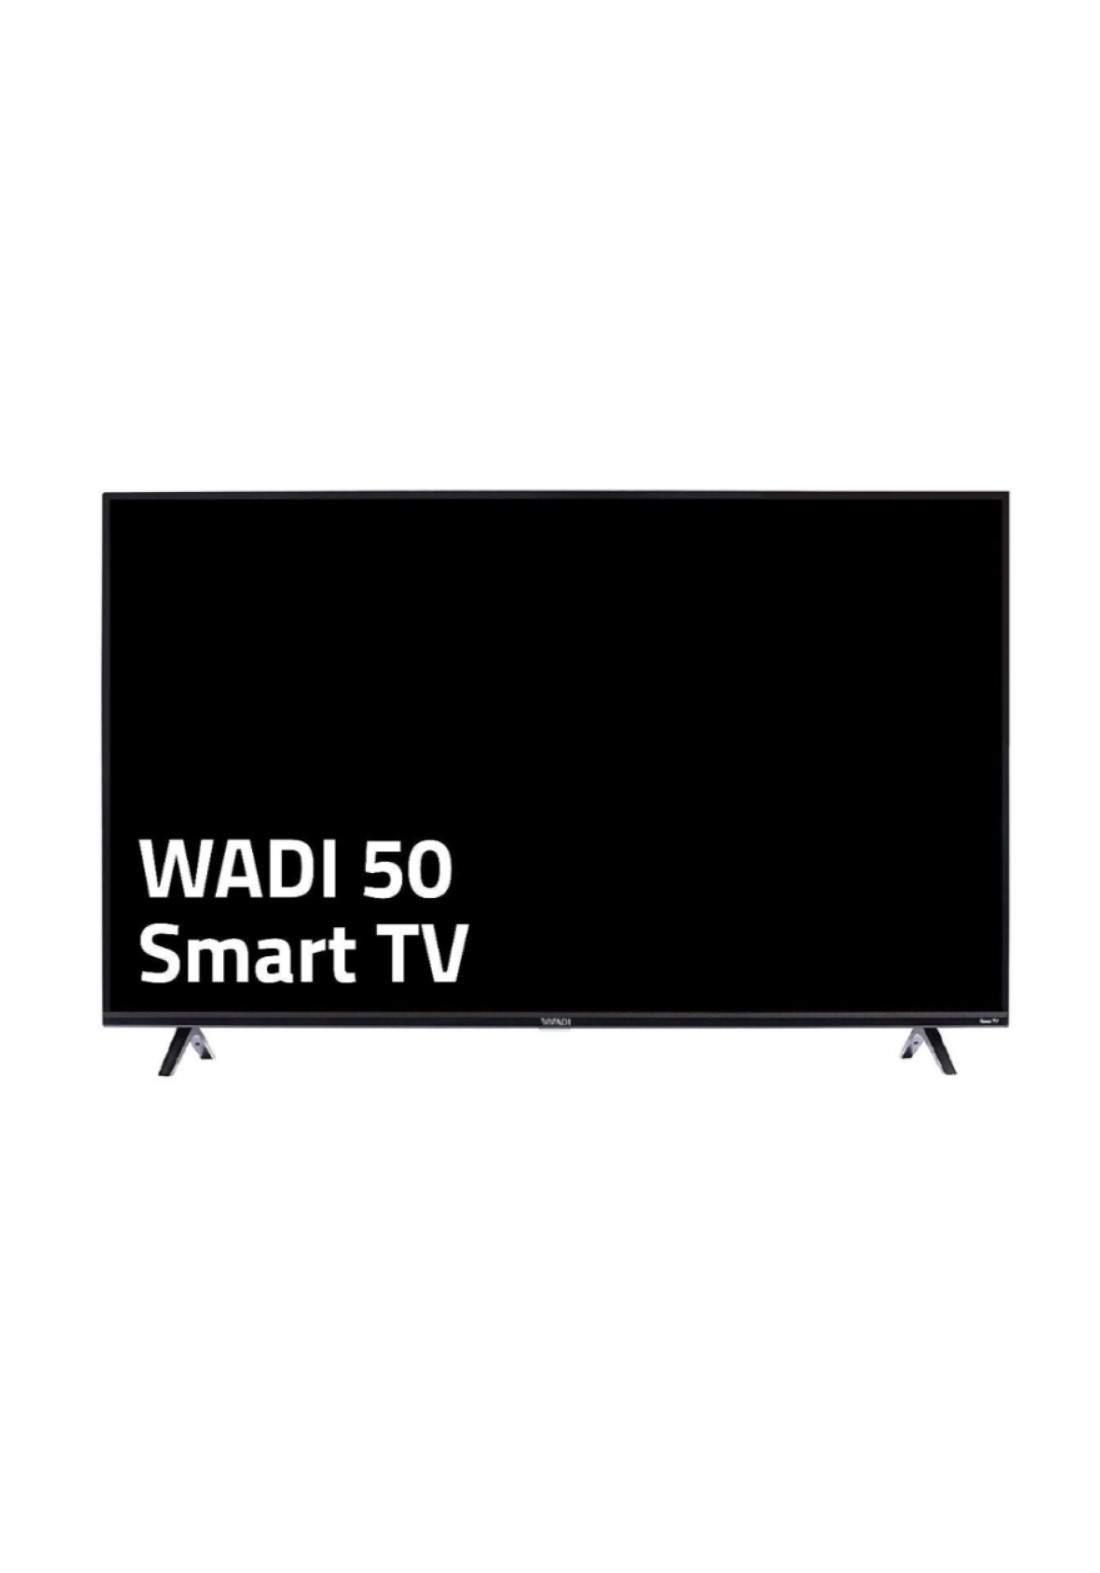 Wadi 50 Inch Smart TV LED FULL HD TV 4K